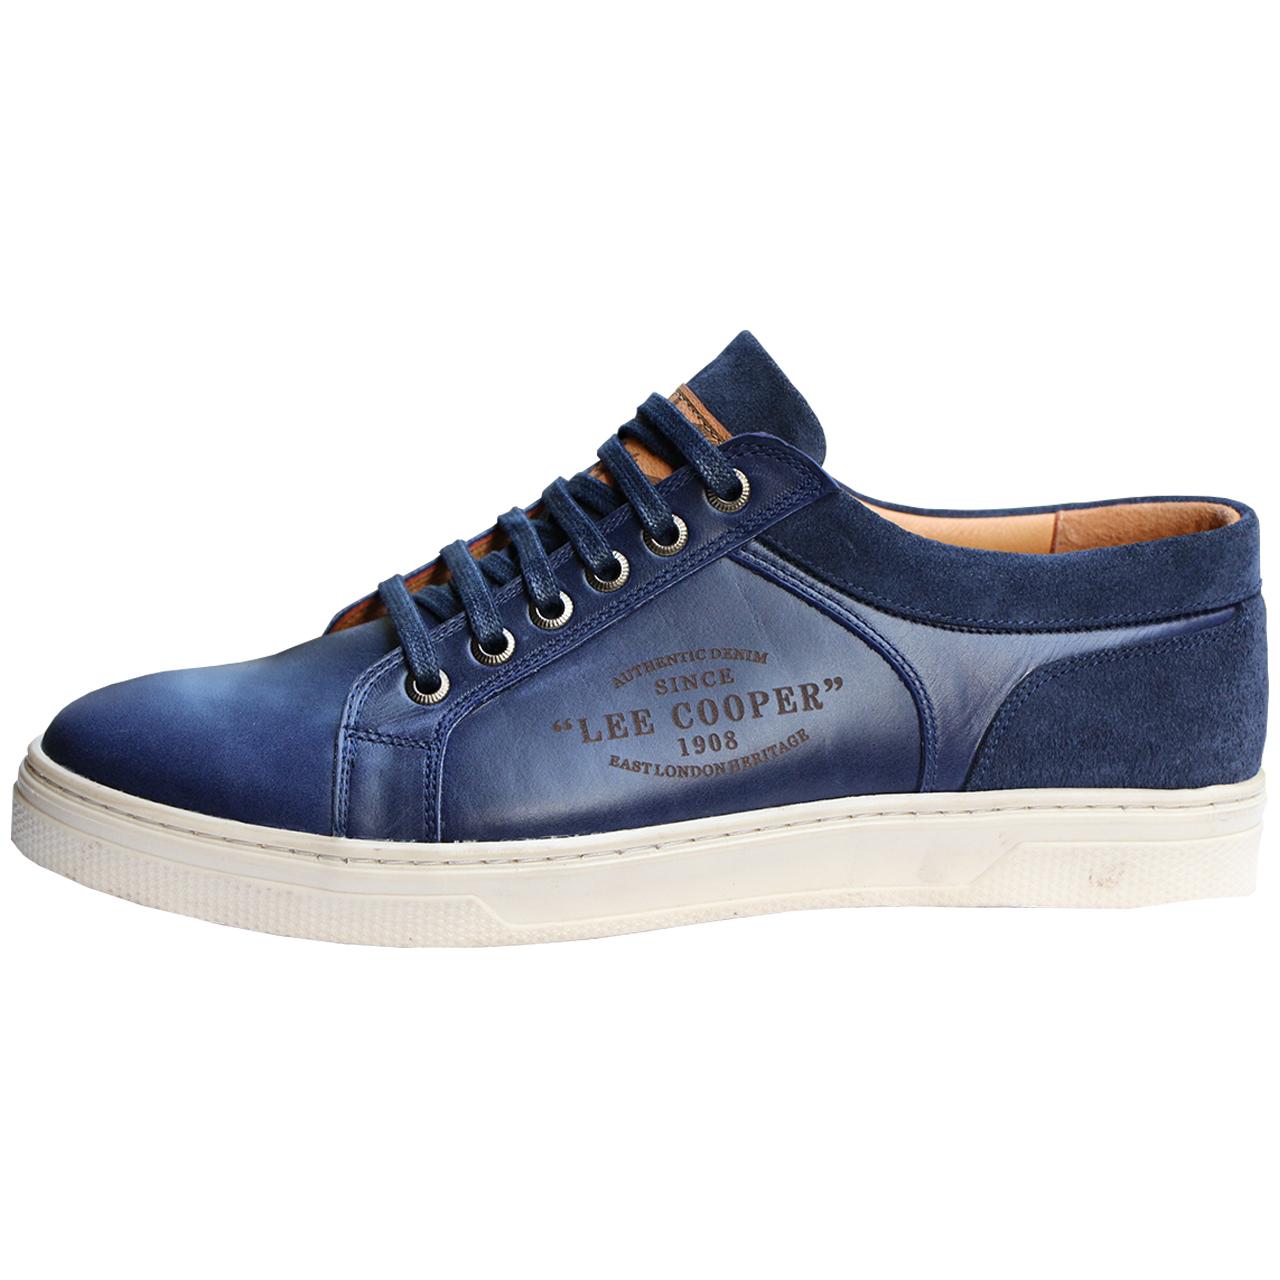 کفش روزمره مردانه لی کوپر مدل Heritage-nvy